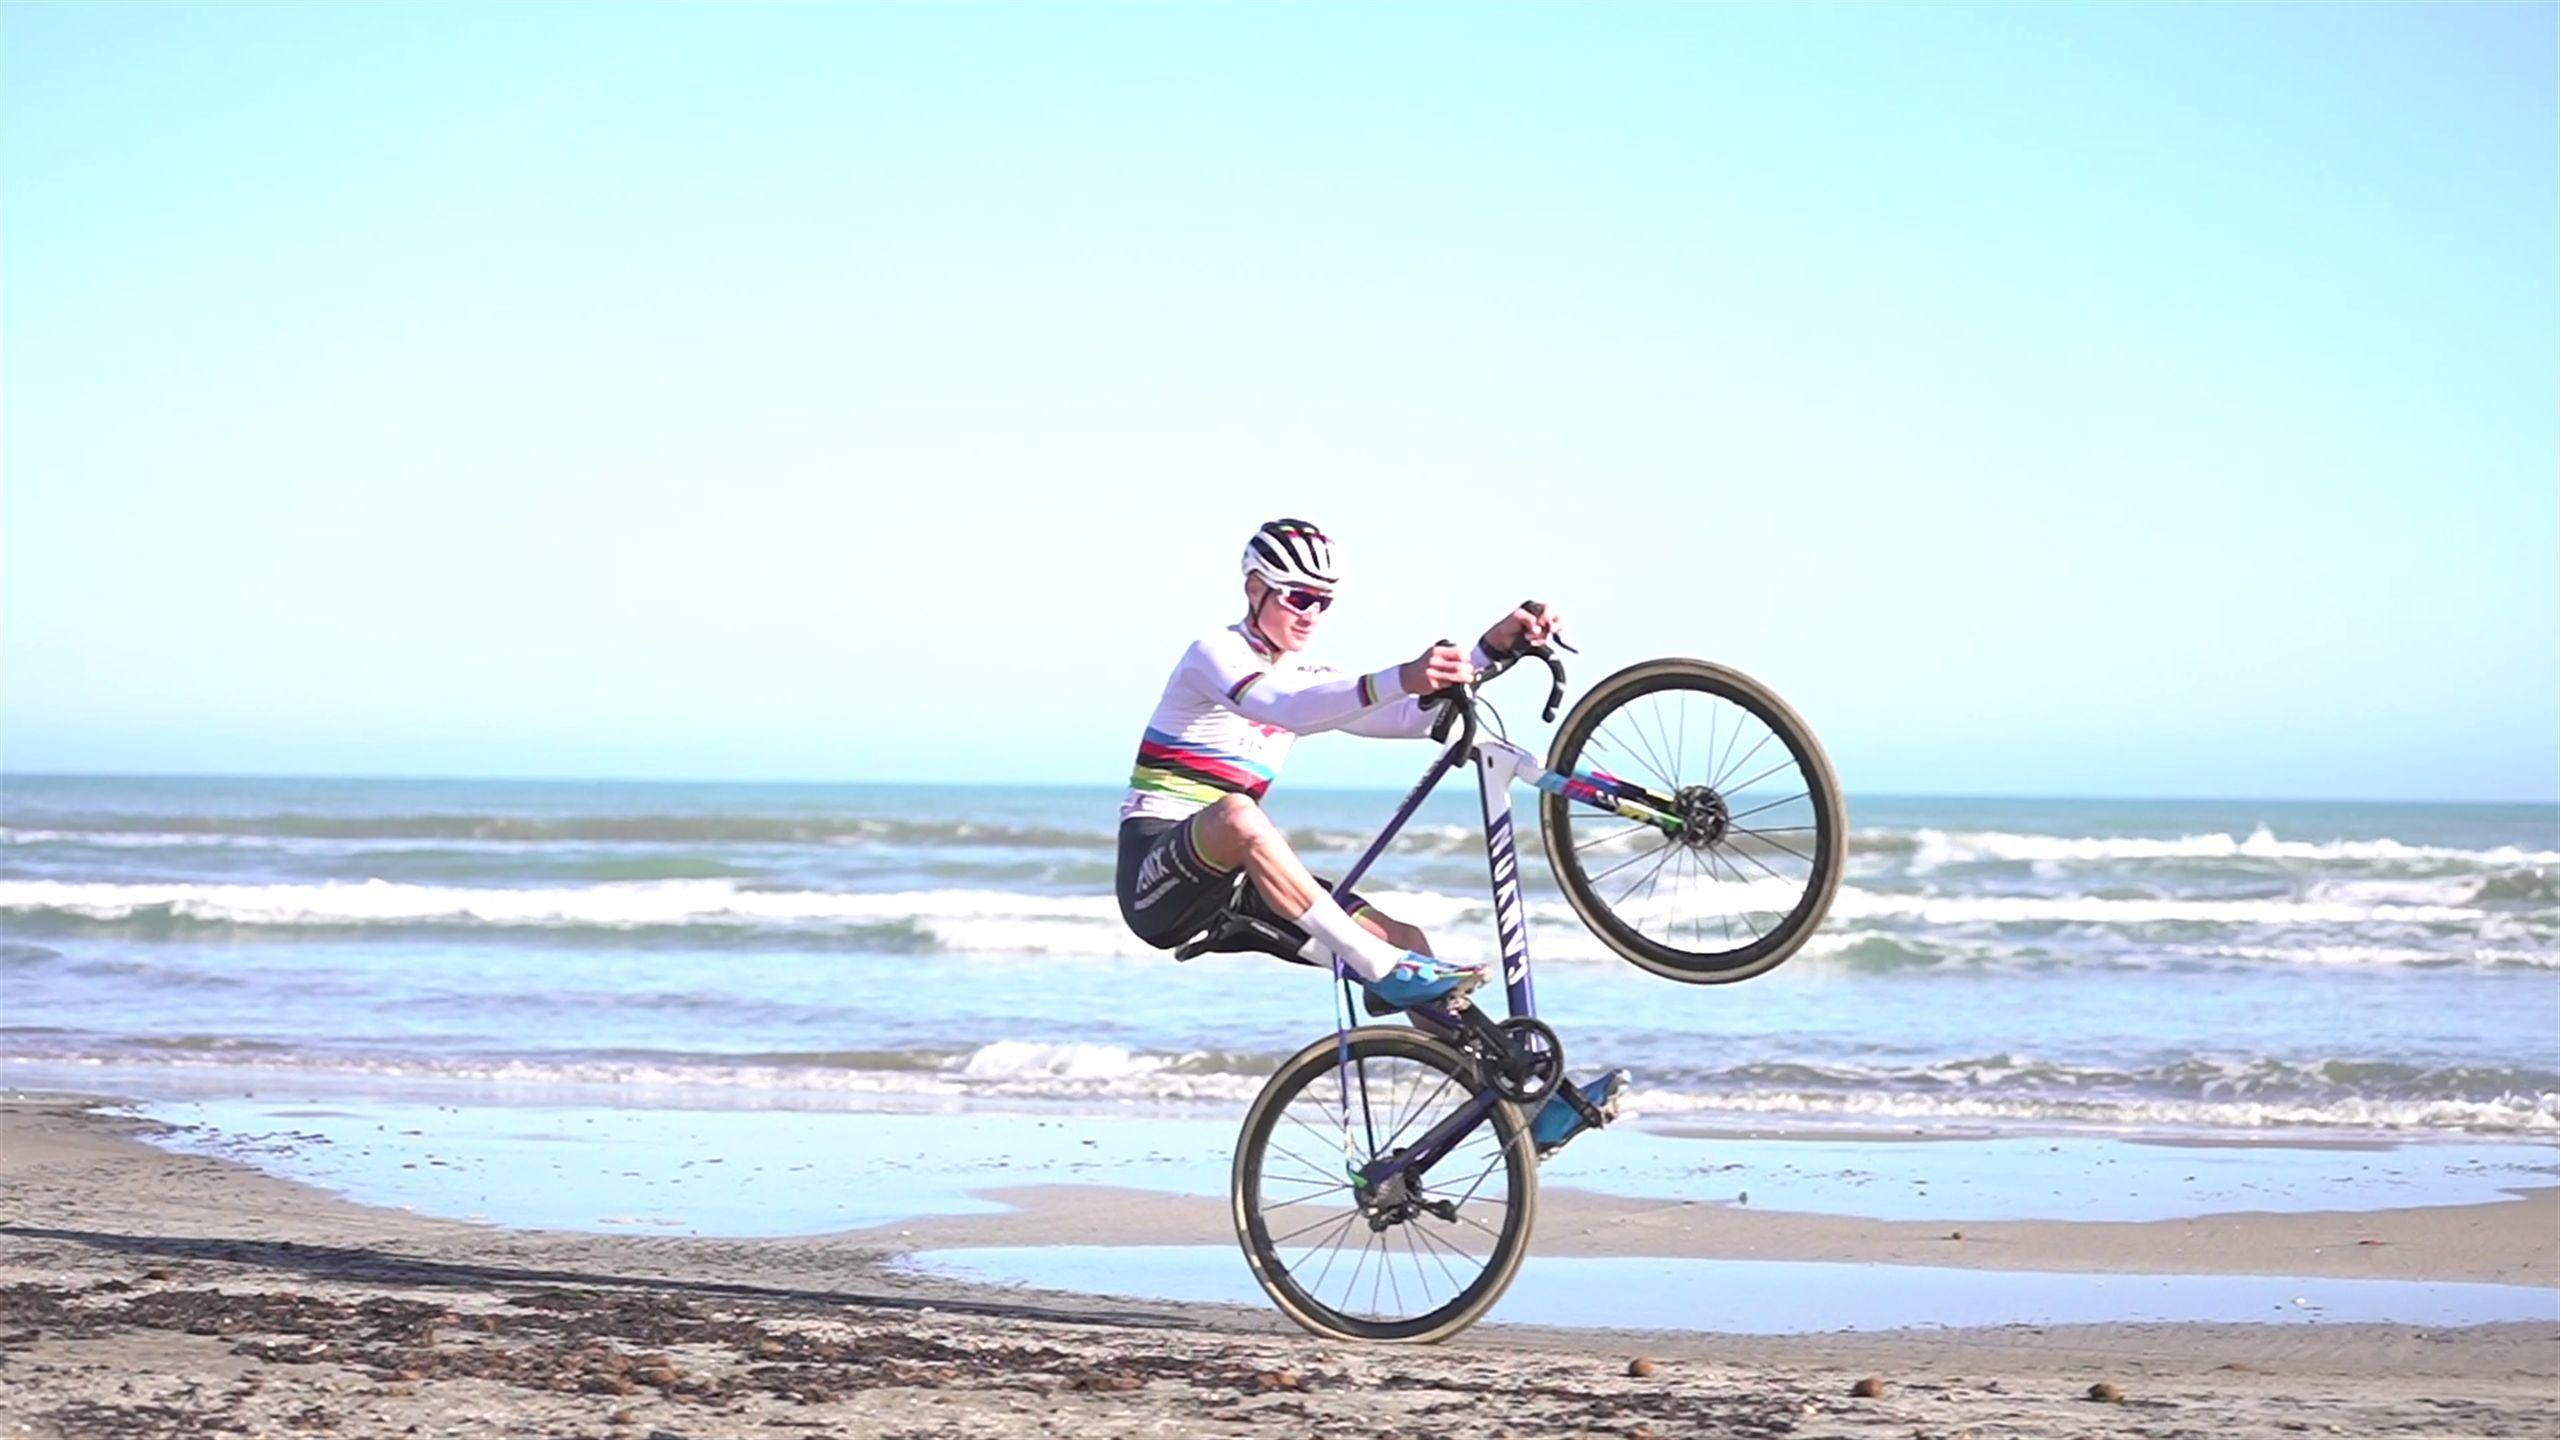 watch mathieu van der poel training on the beach ahead of cyclo cross world championships